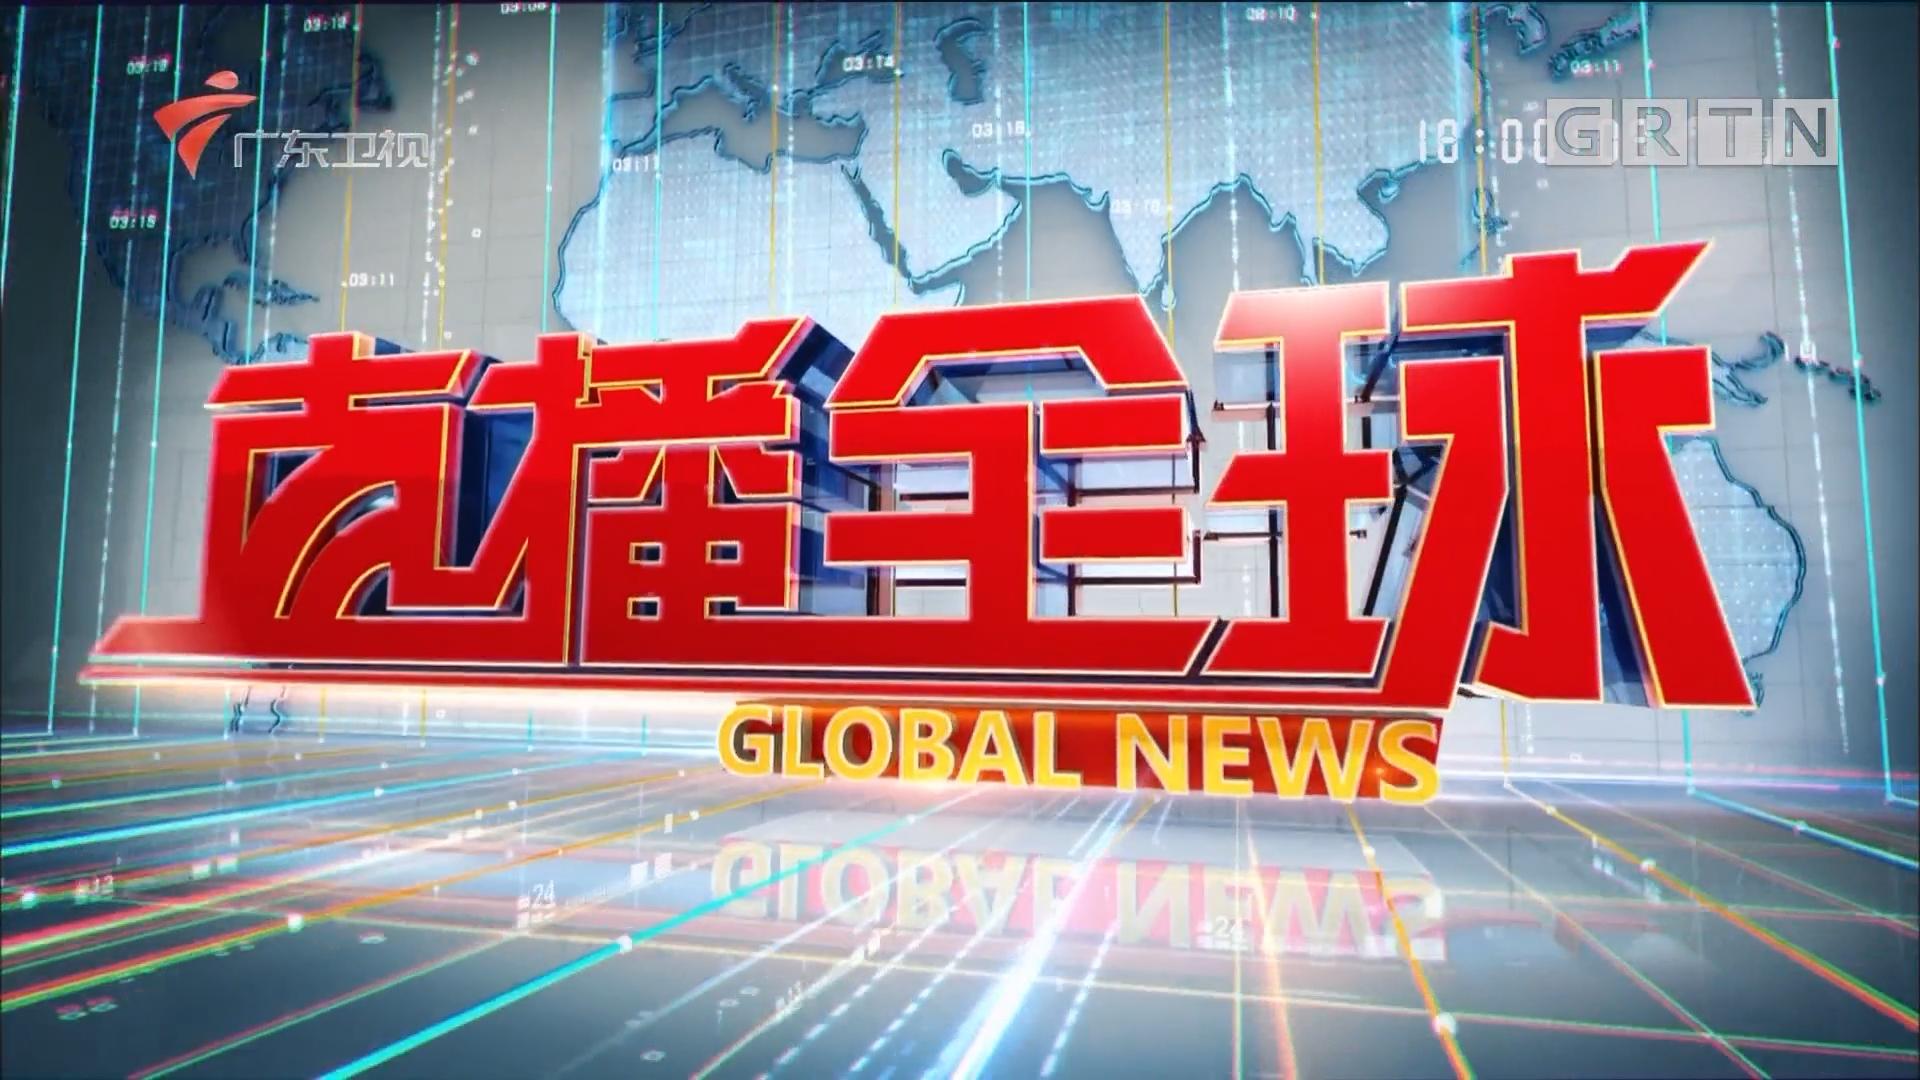 [HD][2018-06-18]直播全球:朝韩今日举行体育会谈 朝韩讨论亚运会共同组队等体育合作事宜